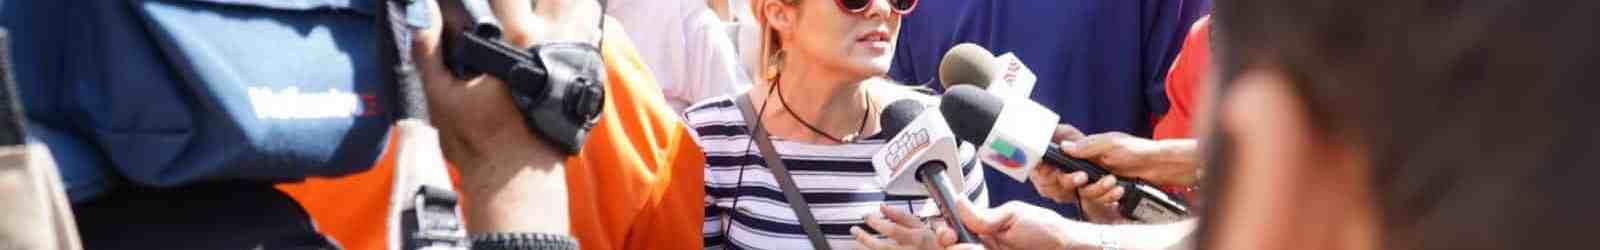 Denuncian donaciones de demandante UPR a senador PNP